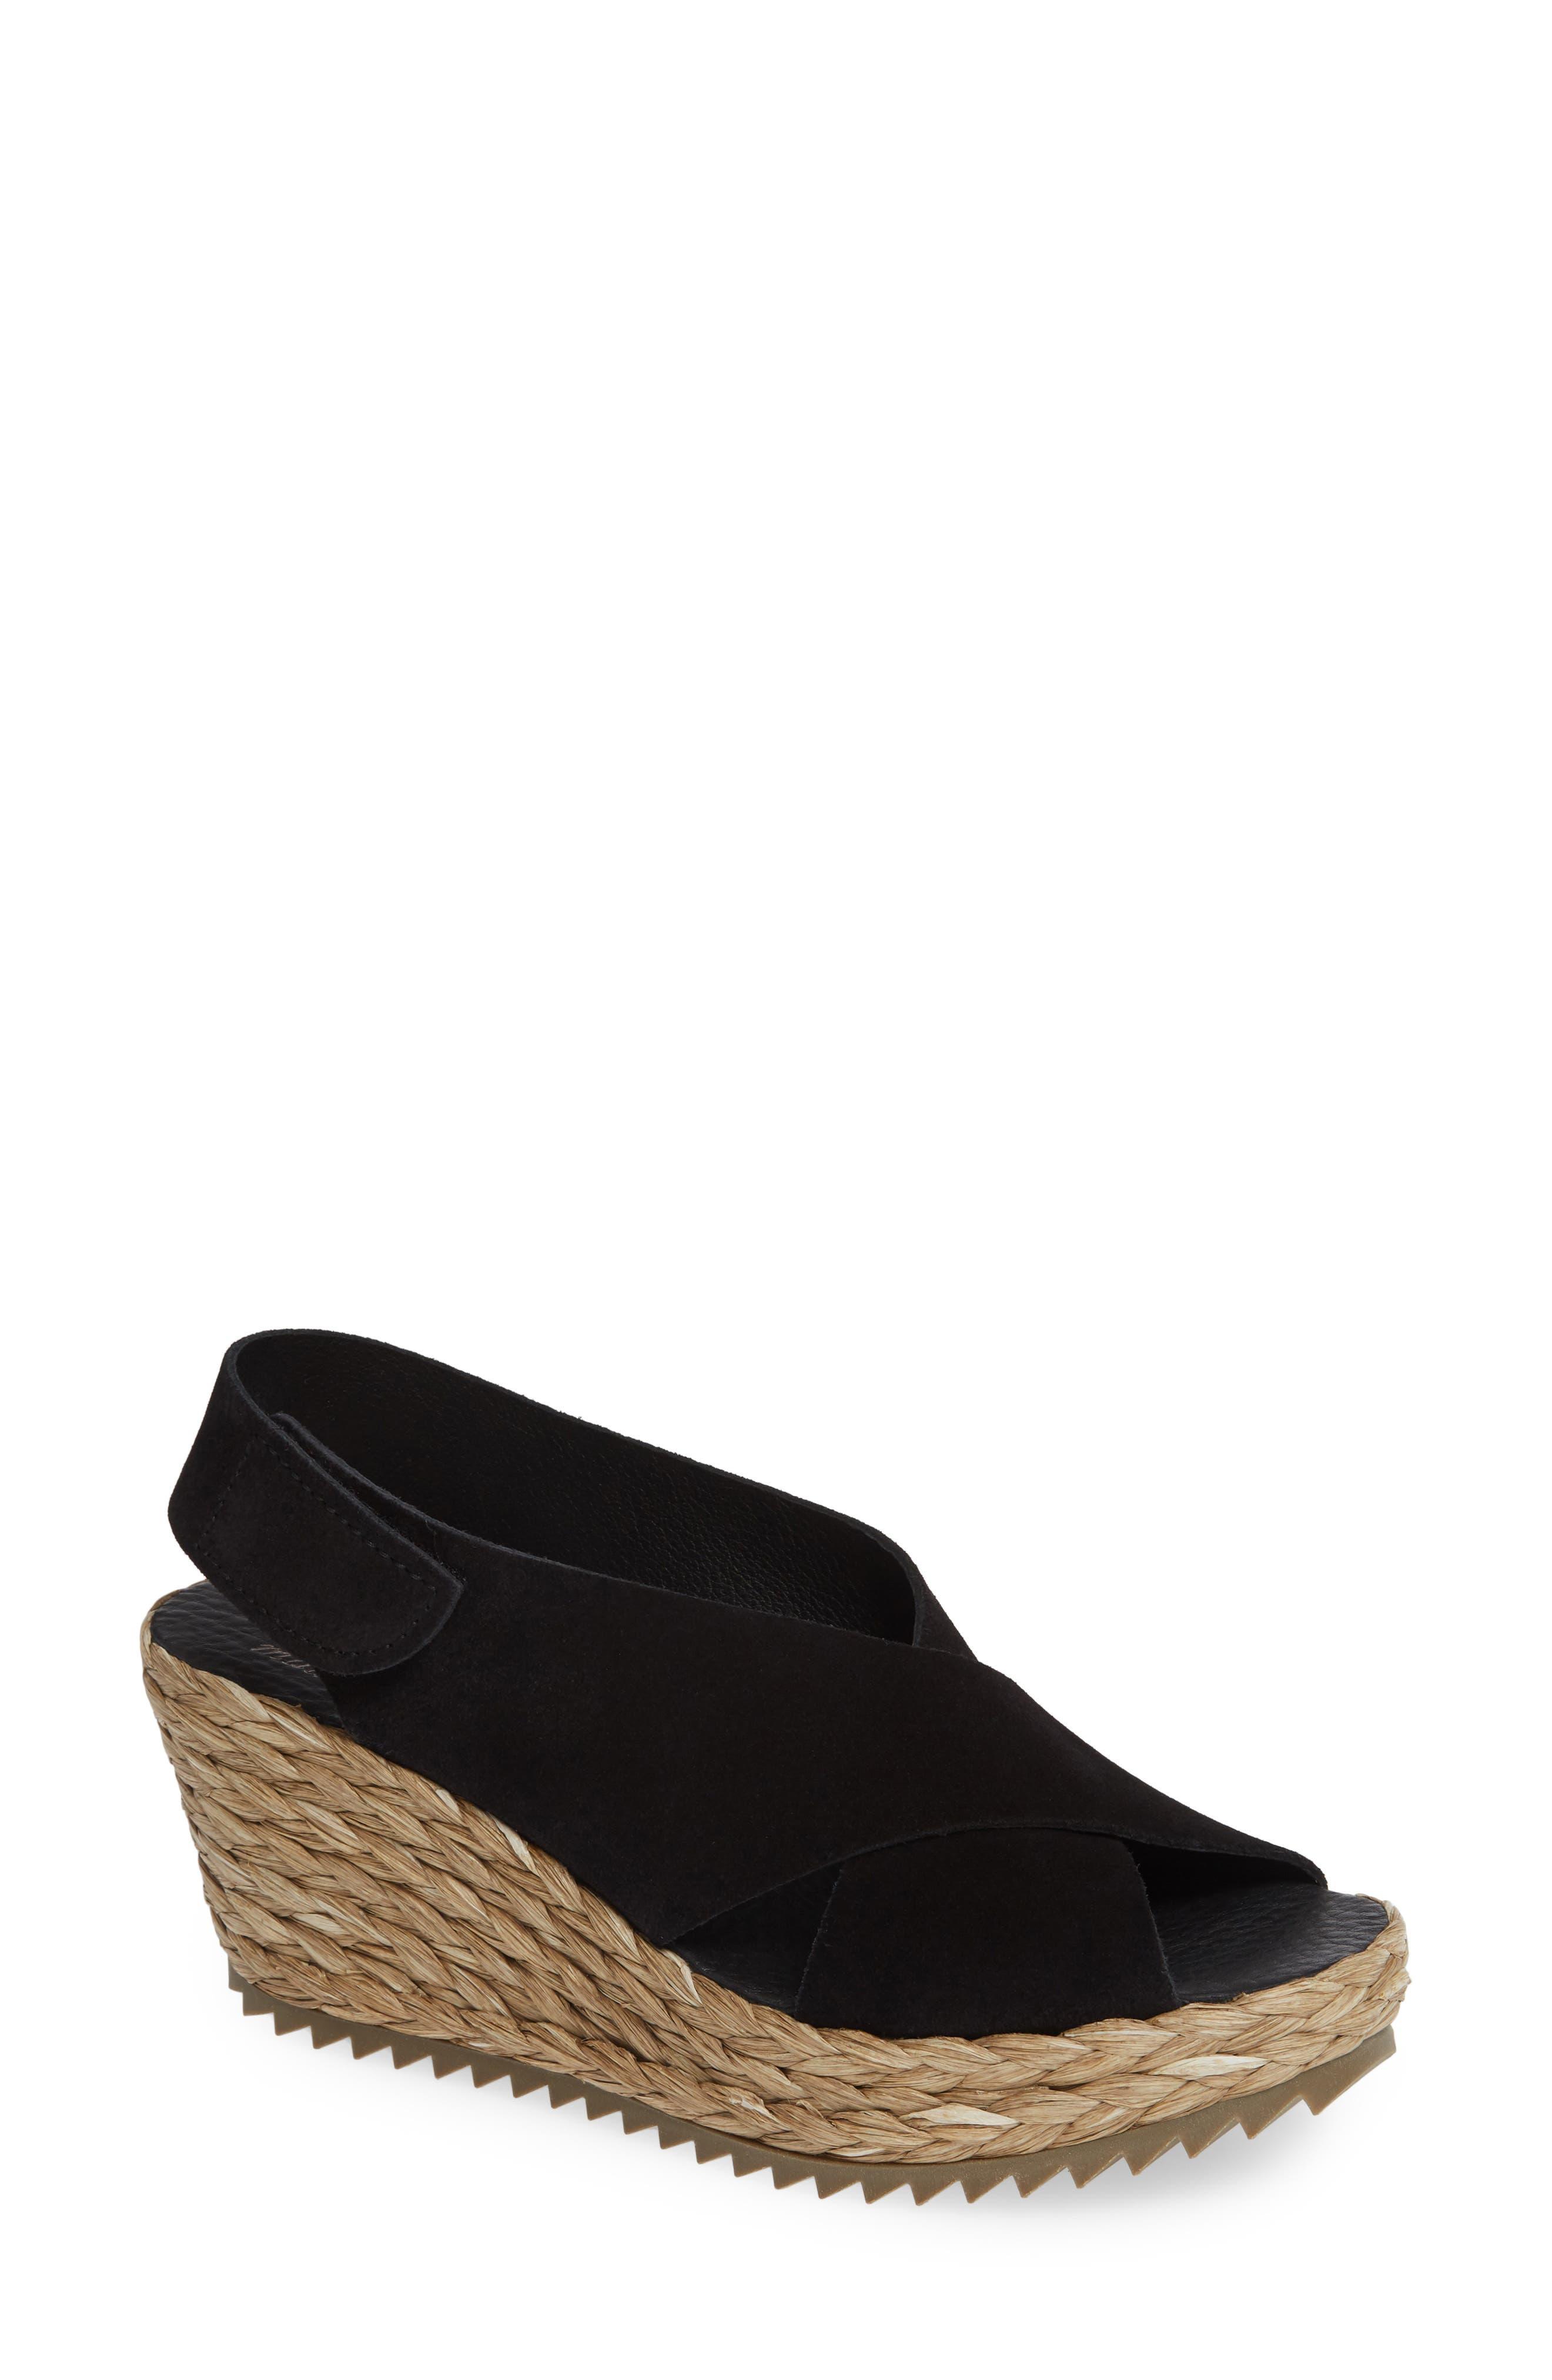 'Federica' Wedge Sandal,                         Main,                         color, BLACK CASTORO/ RAFFIA